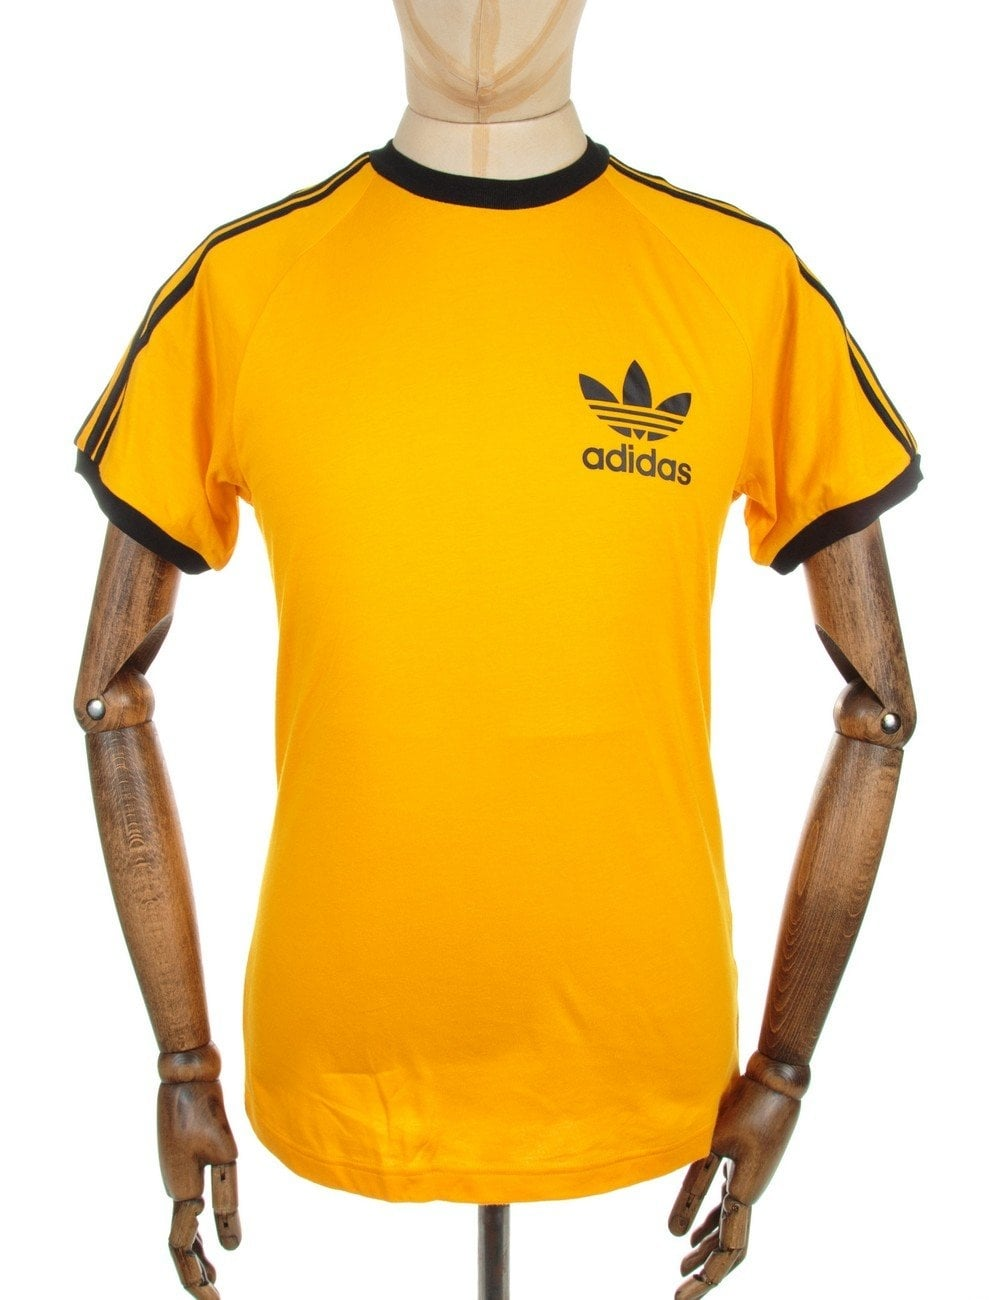 adidas t shirt retro